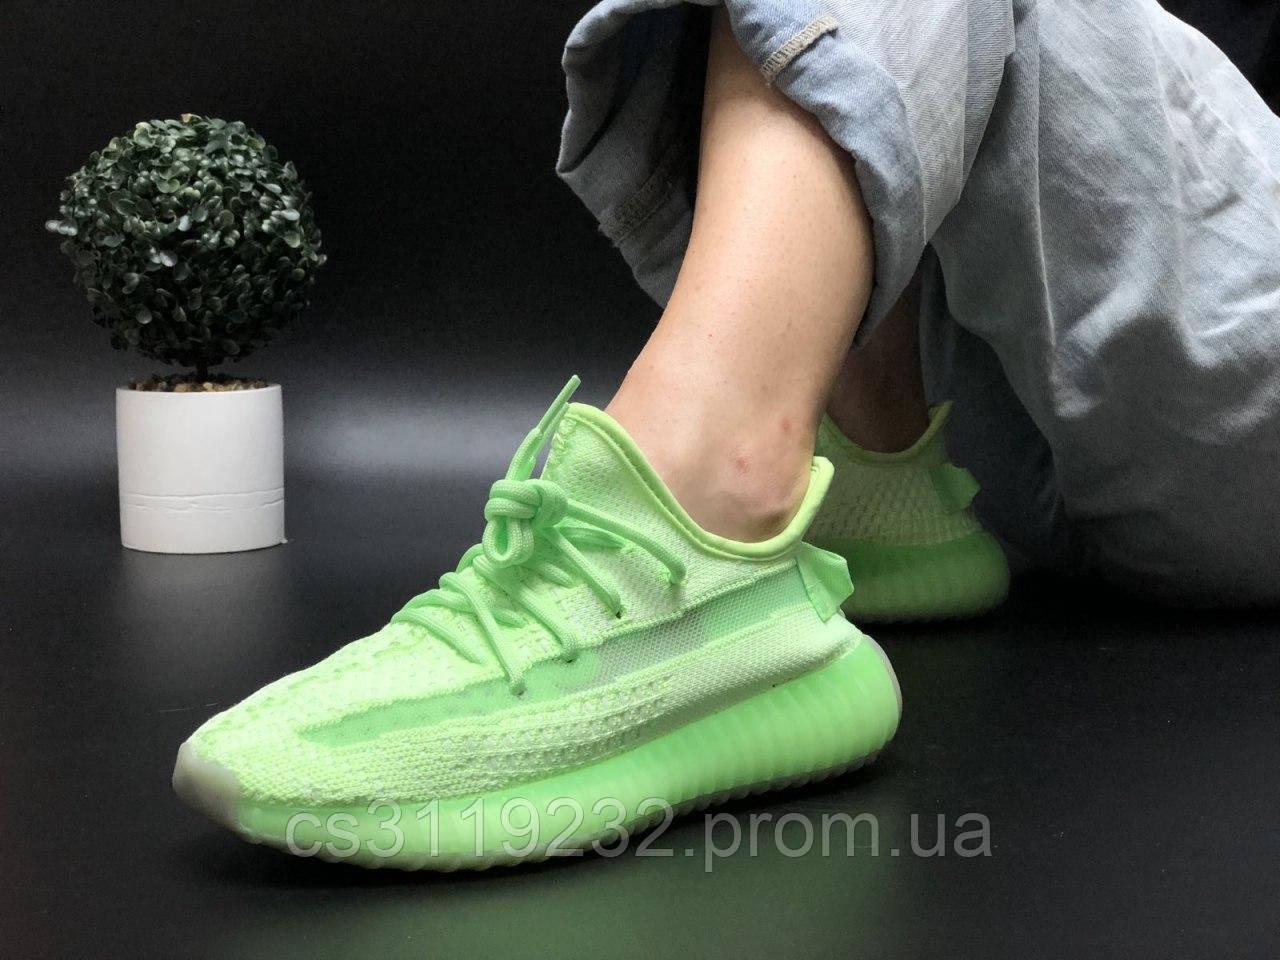 Женские кроссовки Adidas Yeezy v2 350 Glow in dark (зелёный)